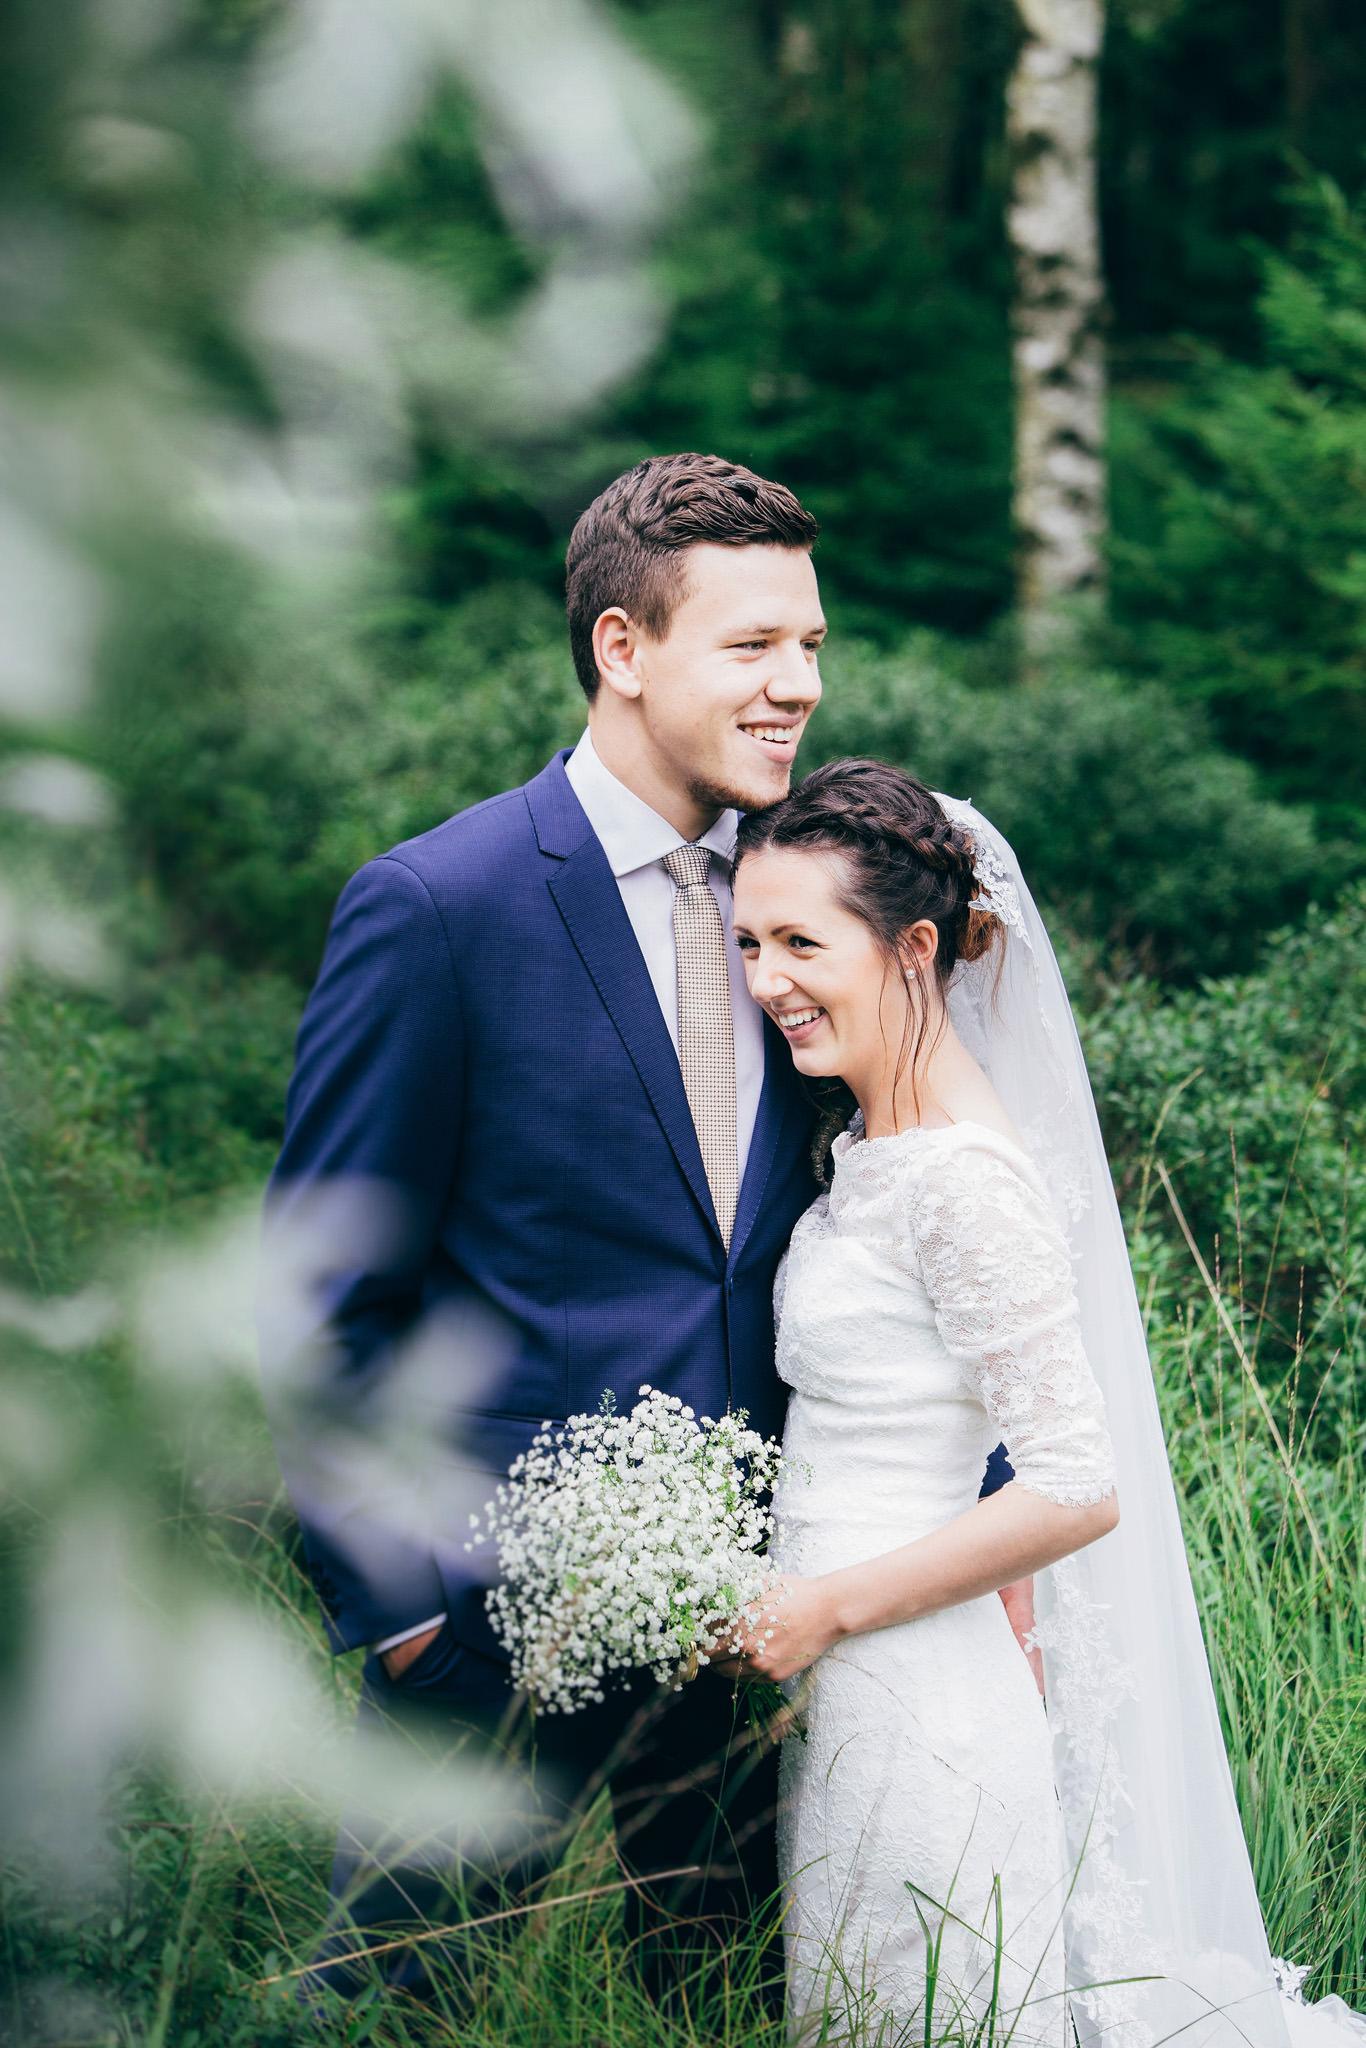 Norway+wedding+photographer+elopement+pre+wedding+Casey+Arneson-61.jpg